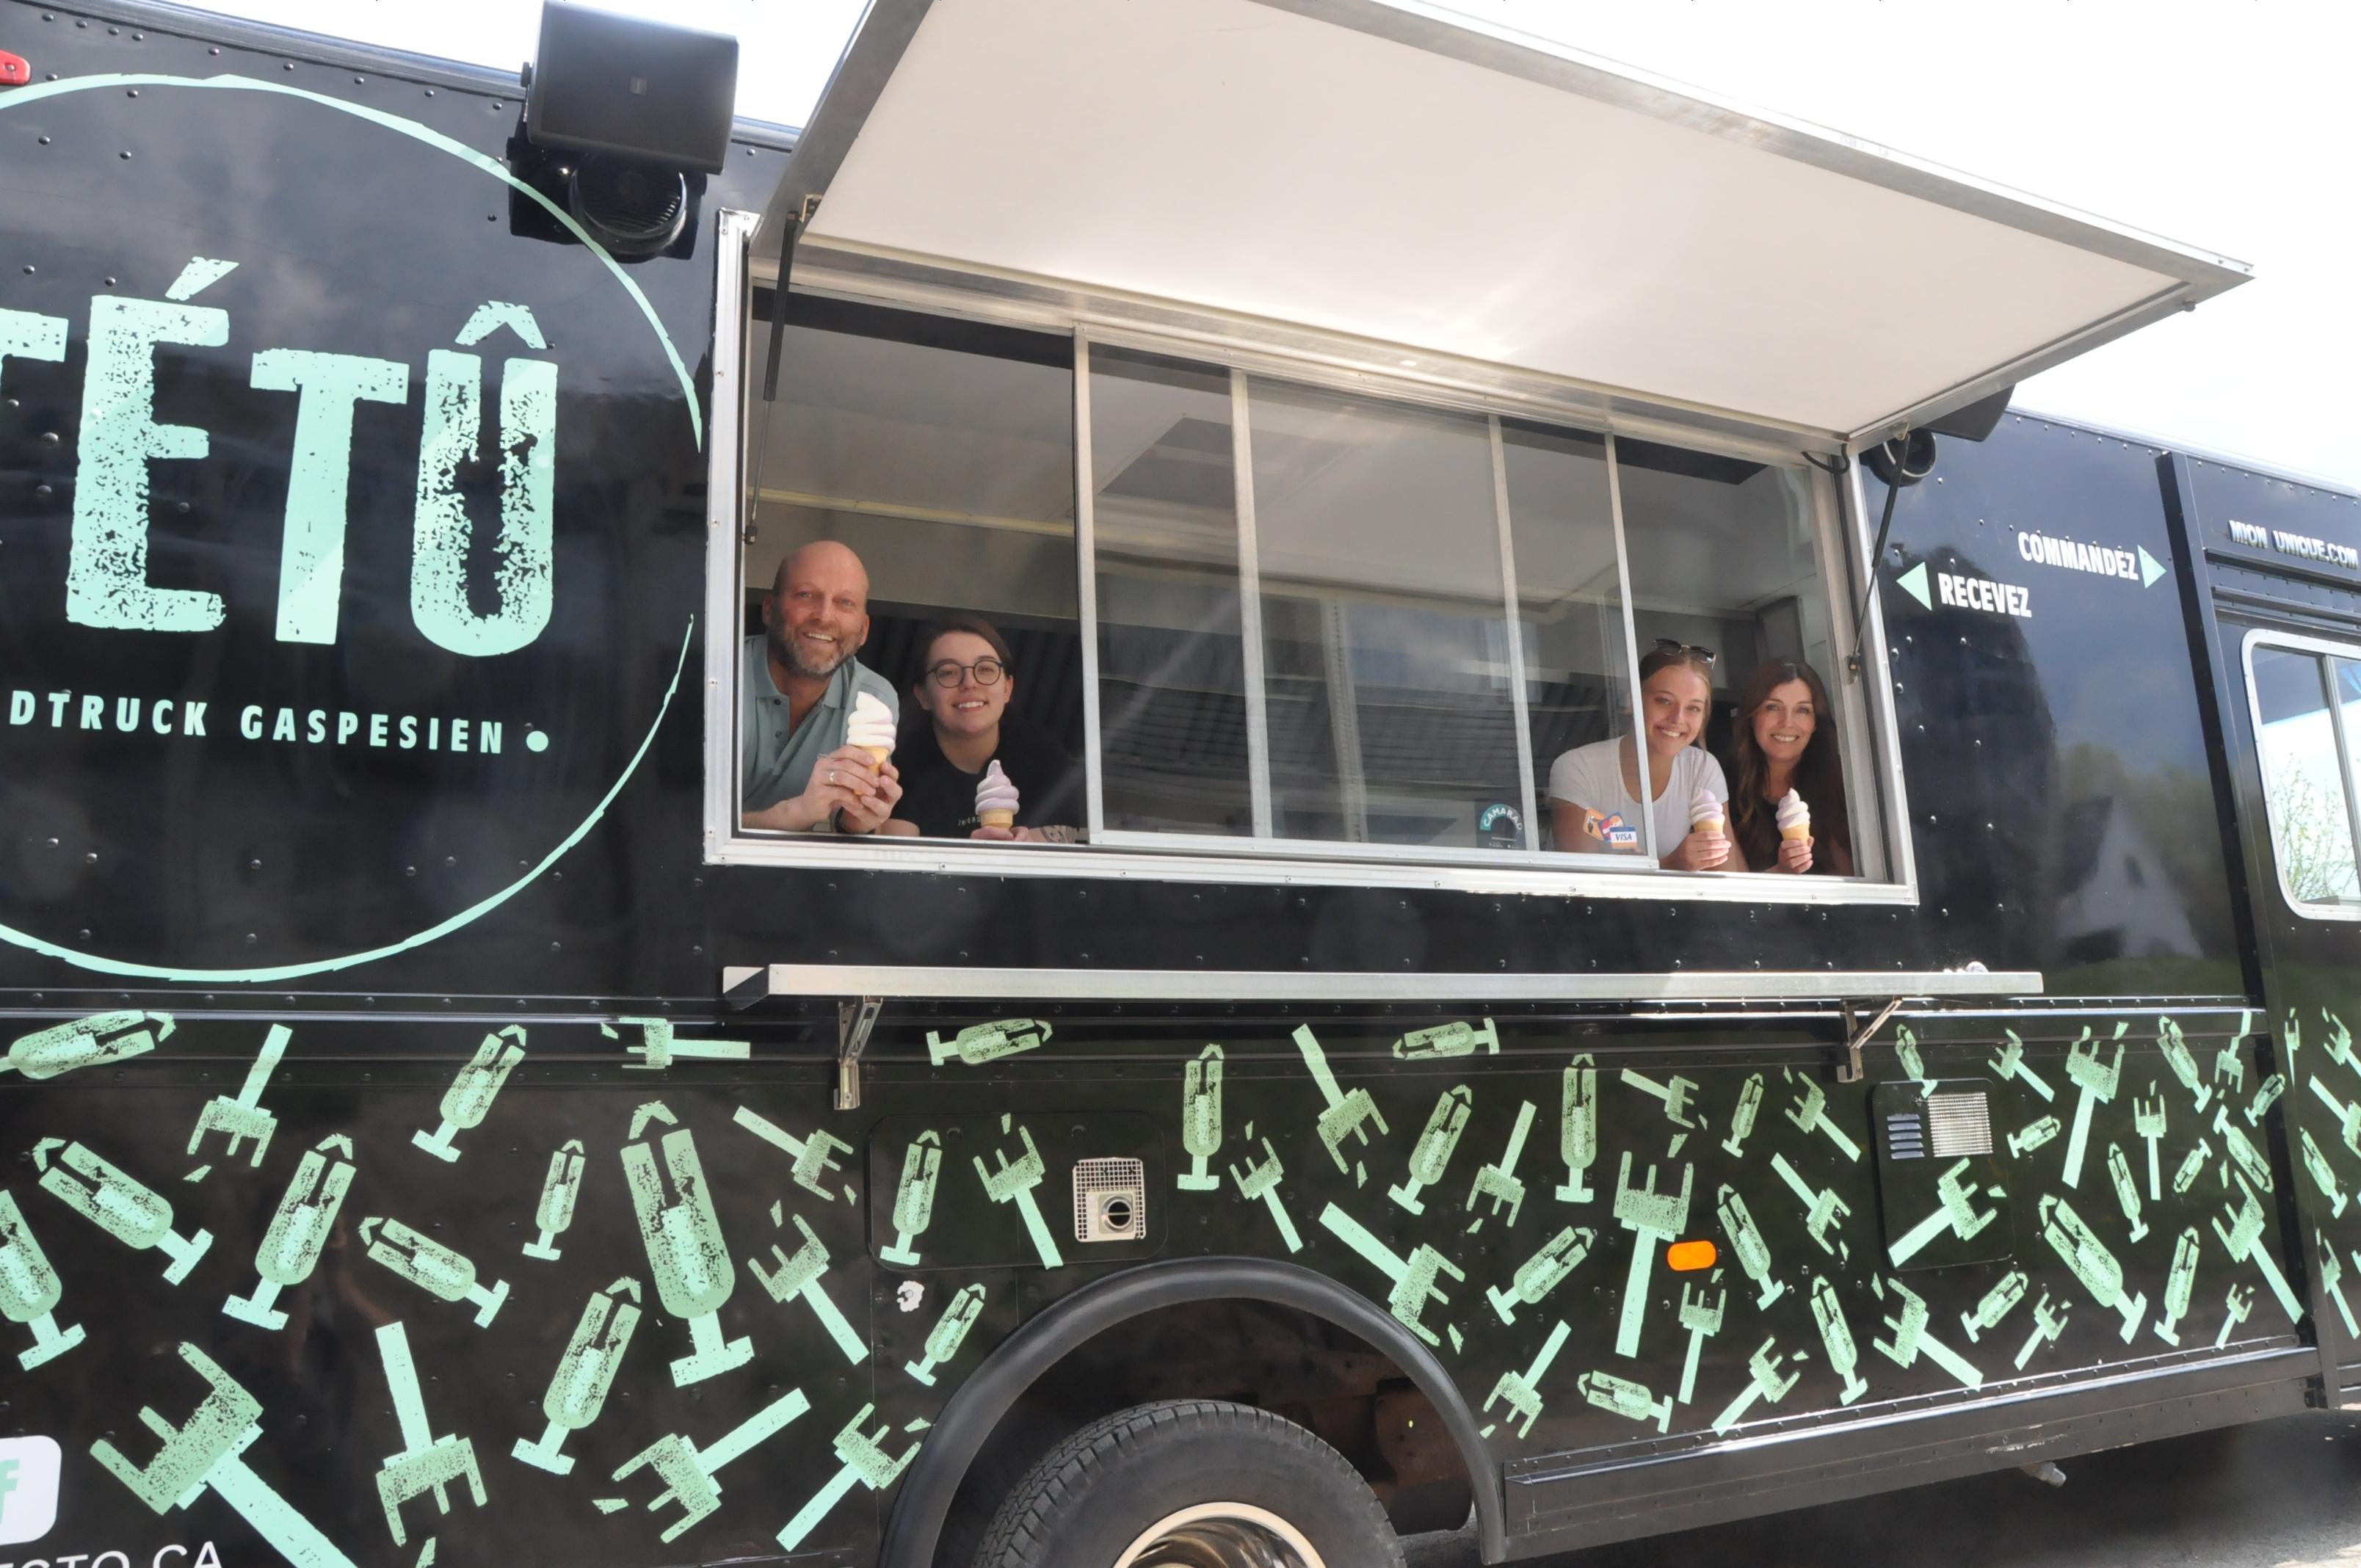 Food Truck Gaspé TÉTÛ